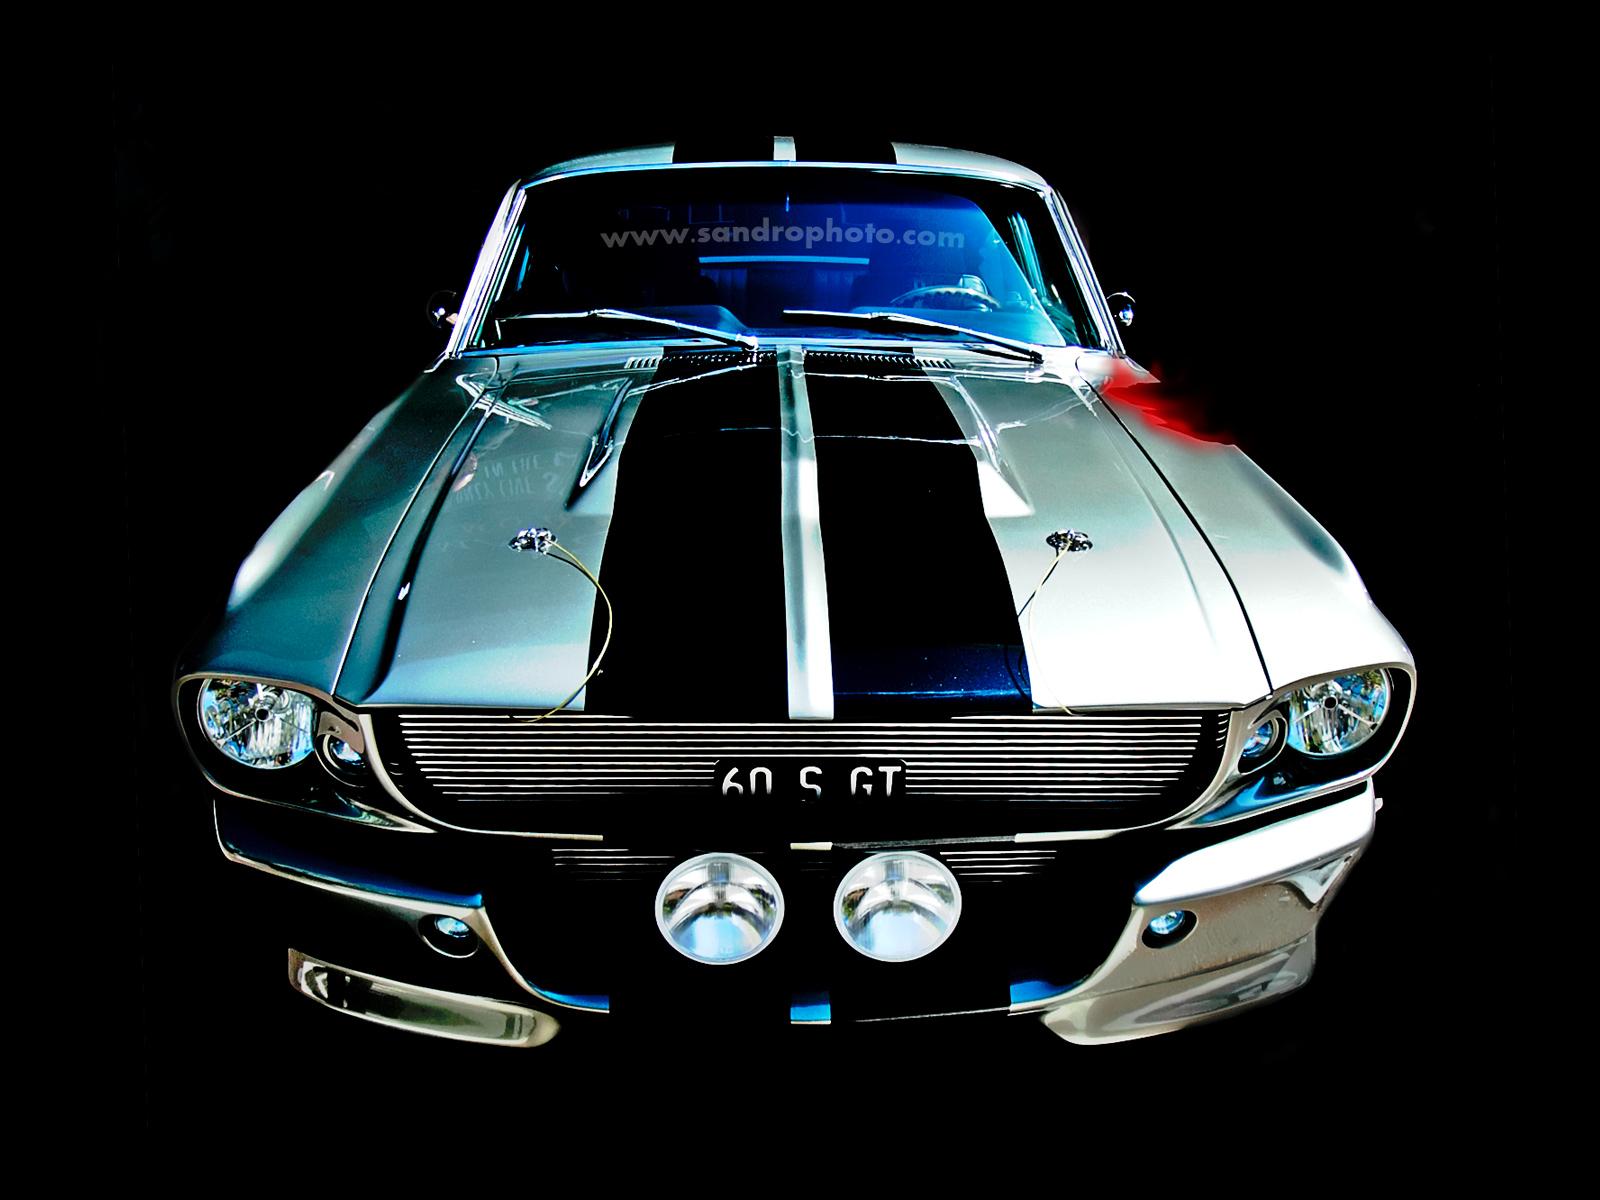 Hd Car wallpapers Muscle car wallpapers for desktop 1600x1200